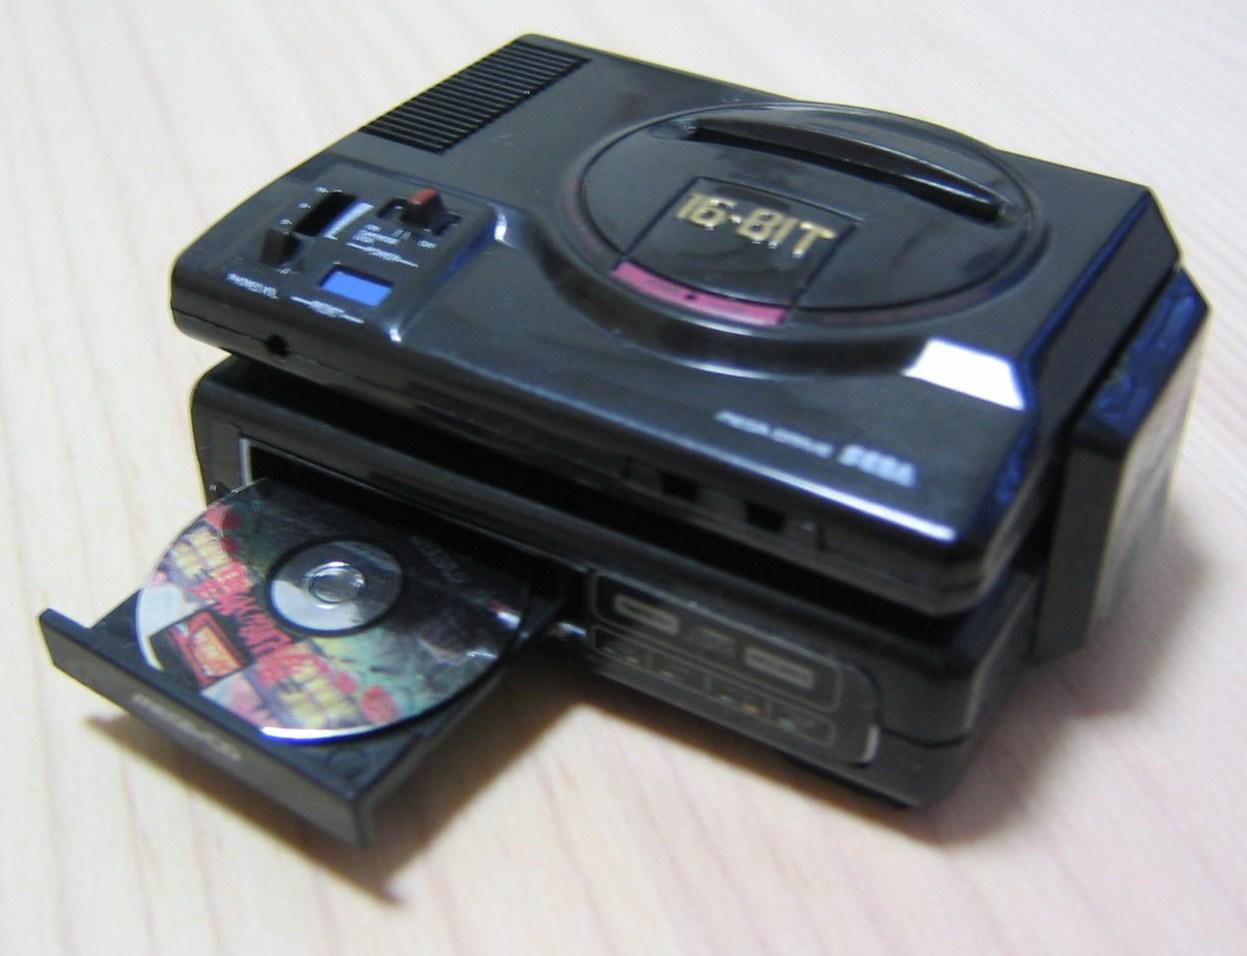 画像出典:http://min38.at.webry.info/201104/article_9.html